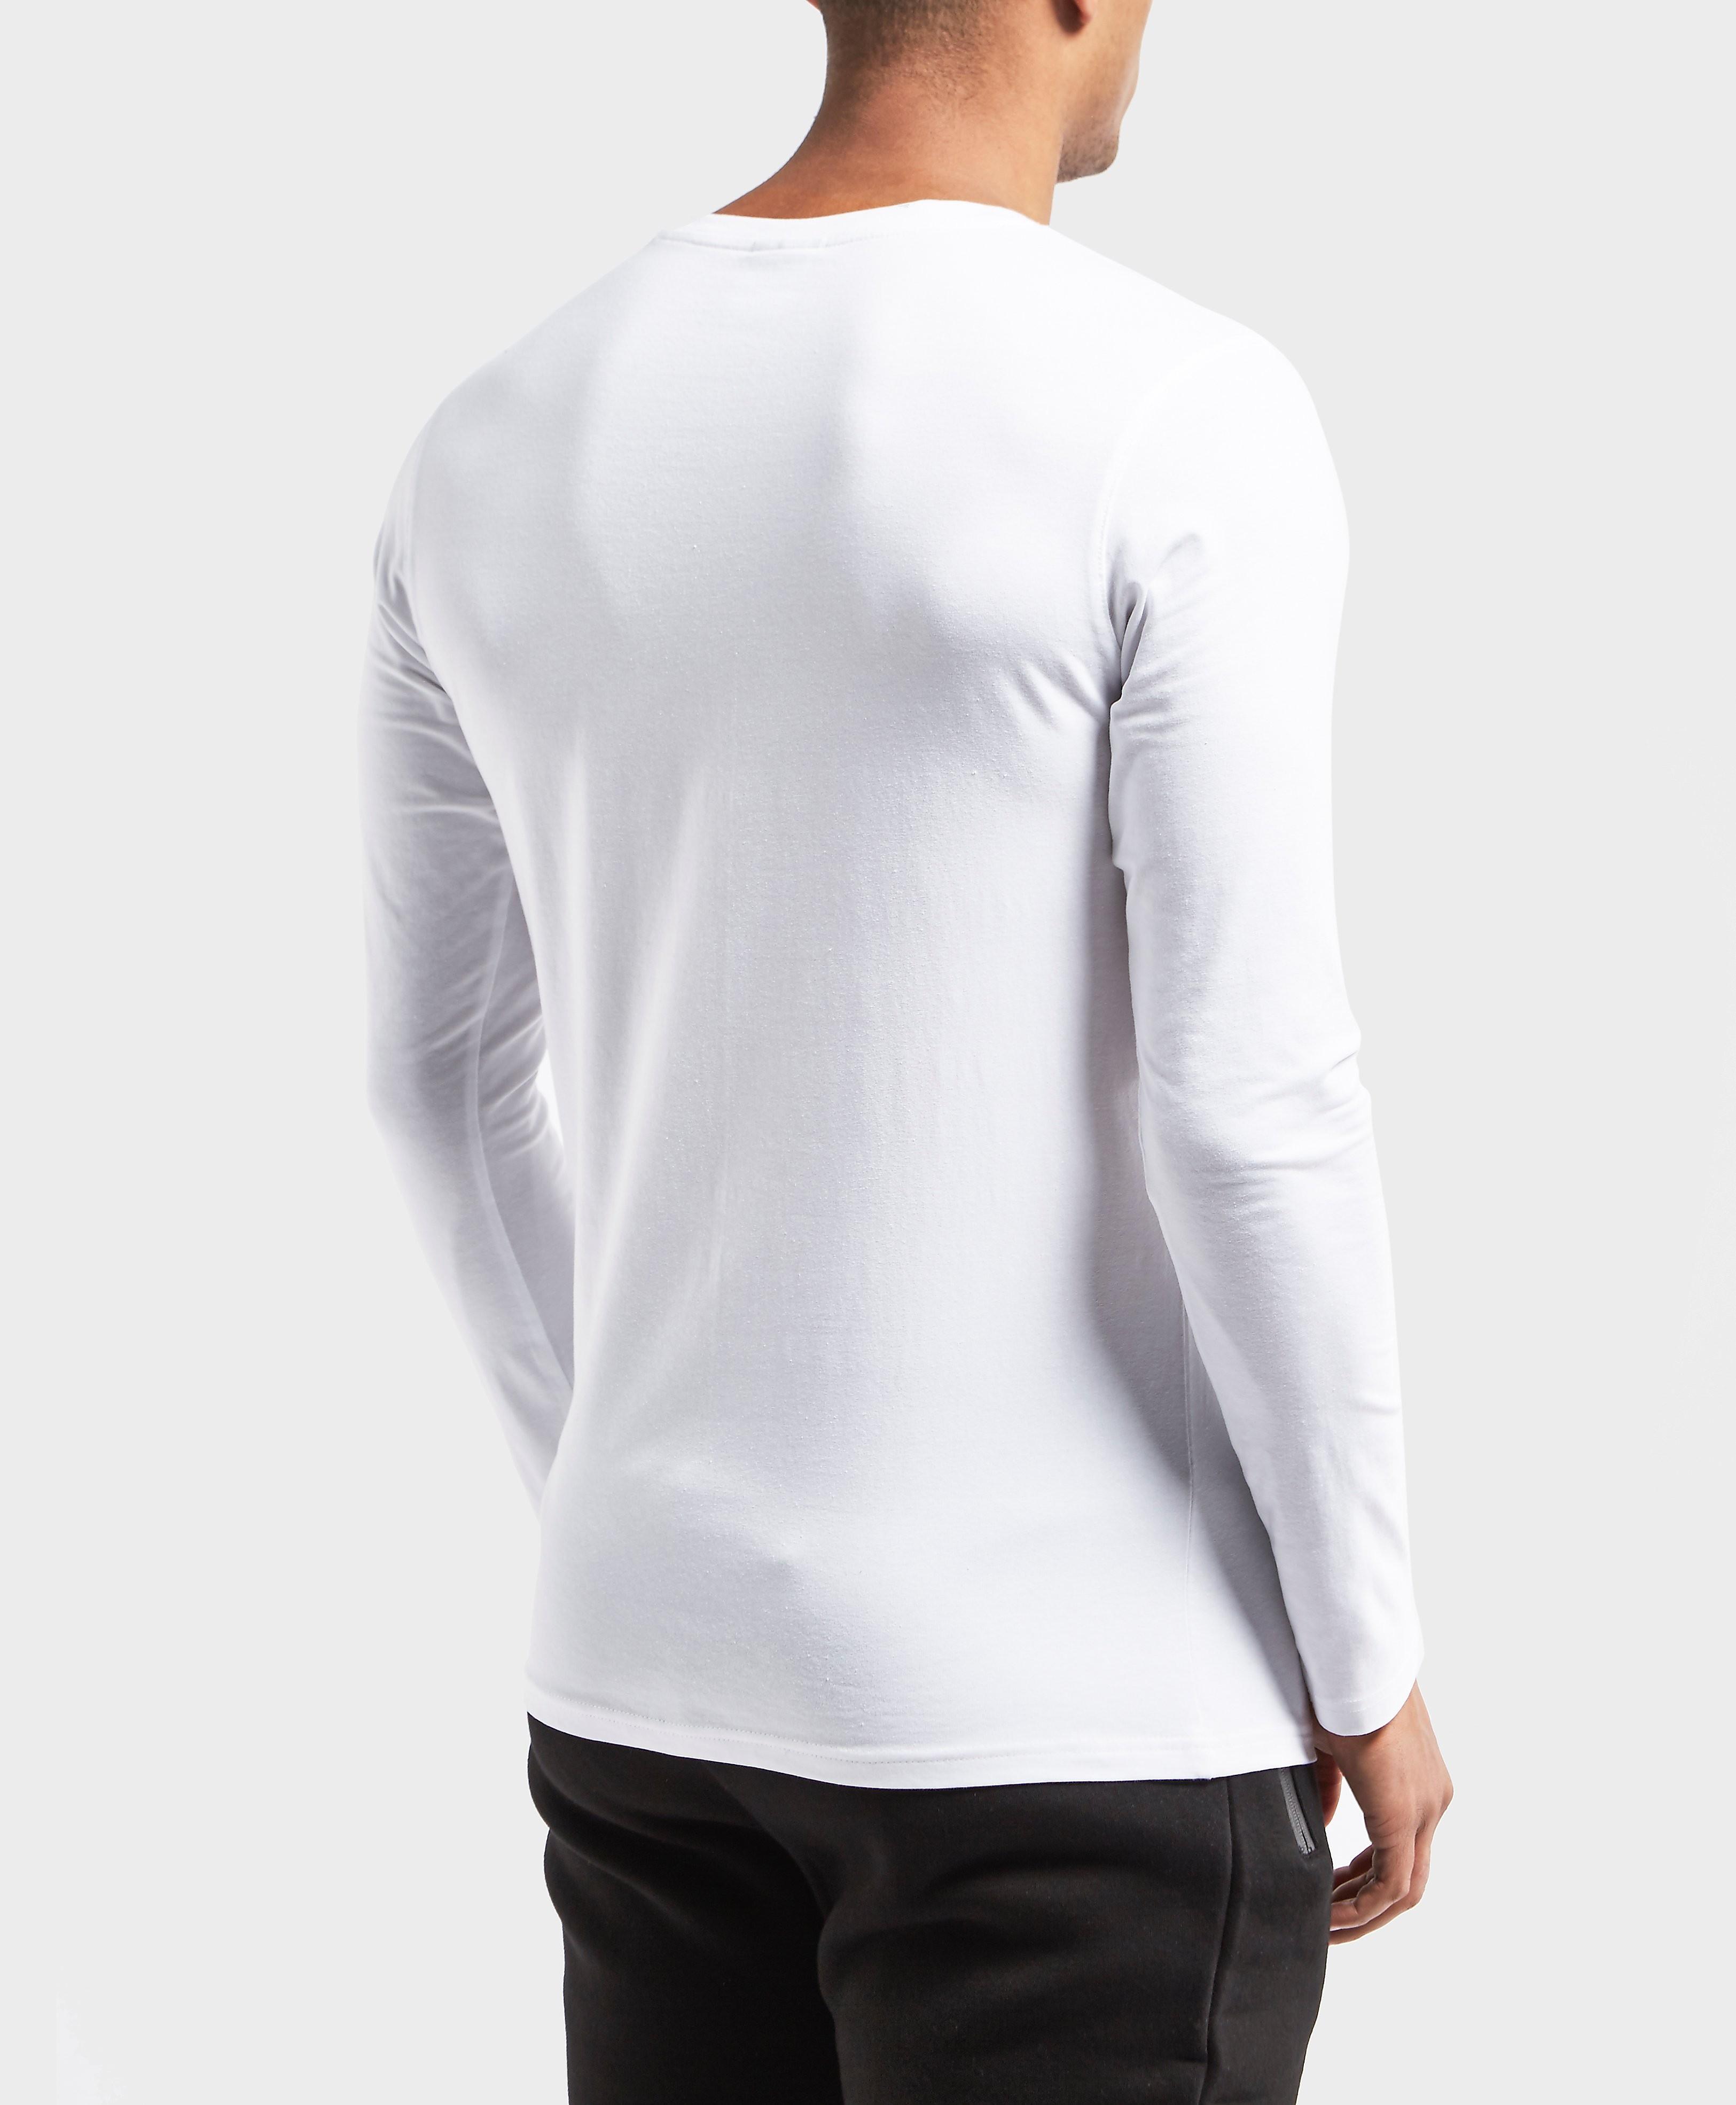 Intense Clothing Rebal Long Sleeve T-Shirt